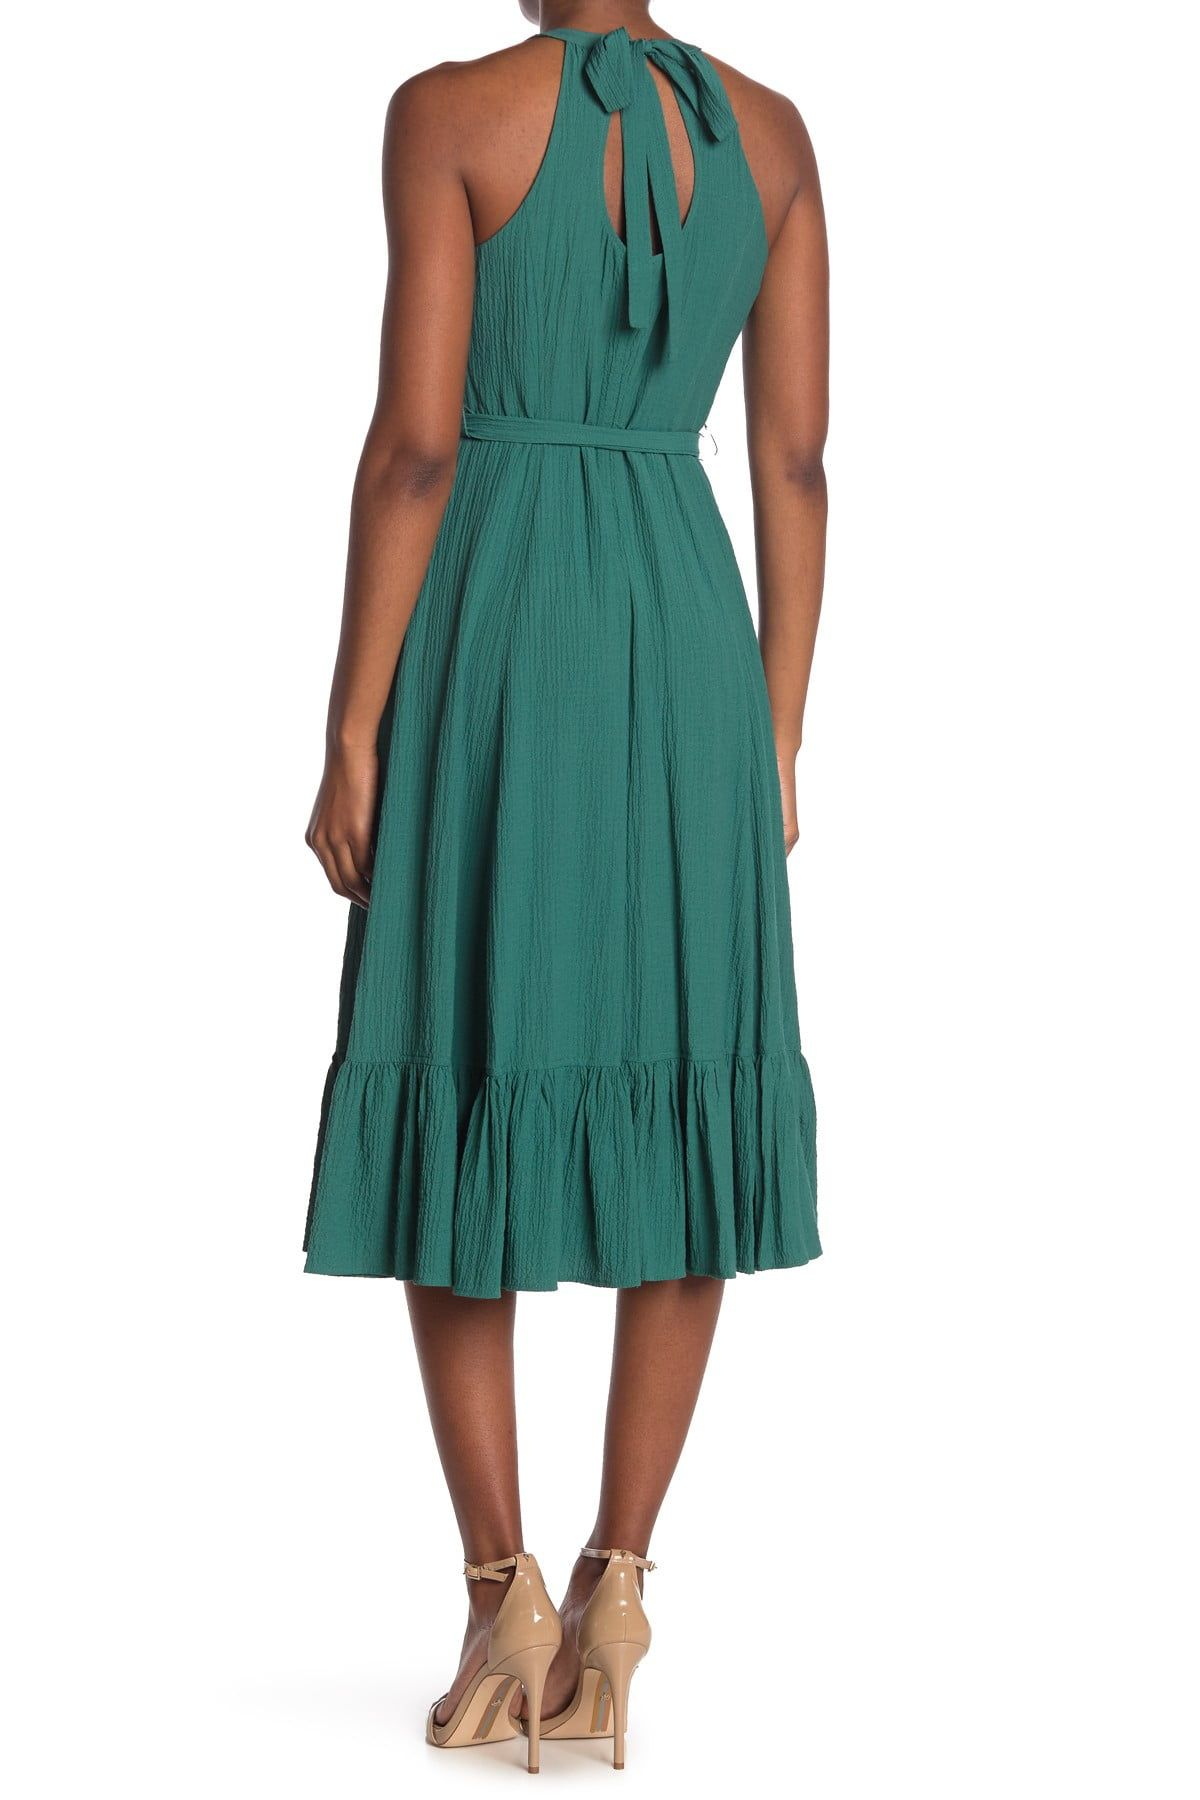 Calvin Klein Gauze Halter Midi Dress Nordstrom Rack In 2021 Halter Midi Dress Midi Dress Nordstrom Dresses [ 1800 x 1200 Pixel ]